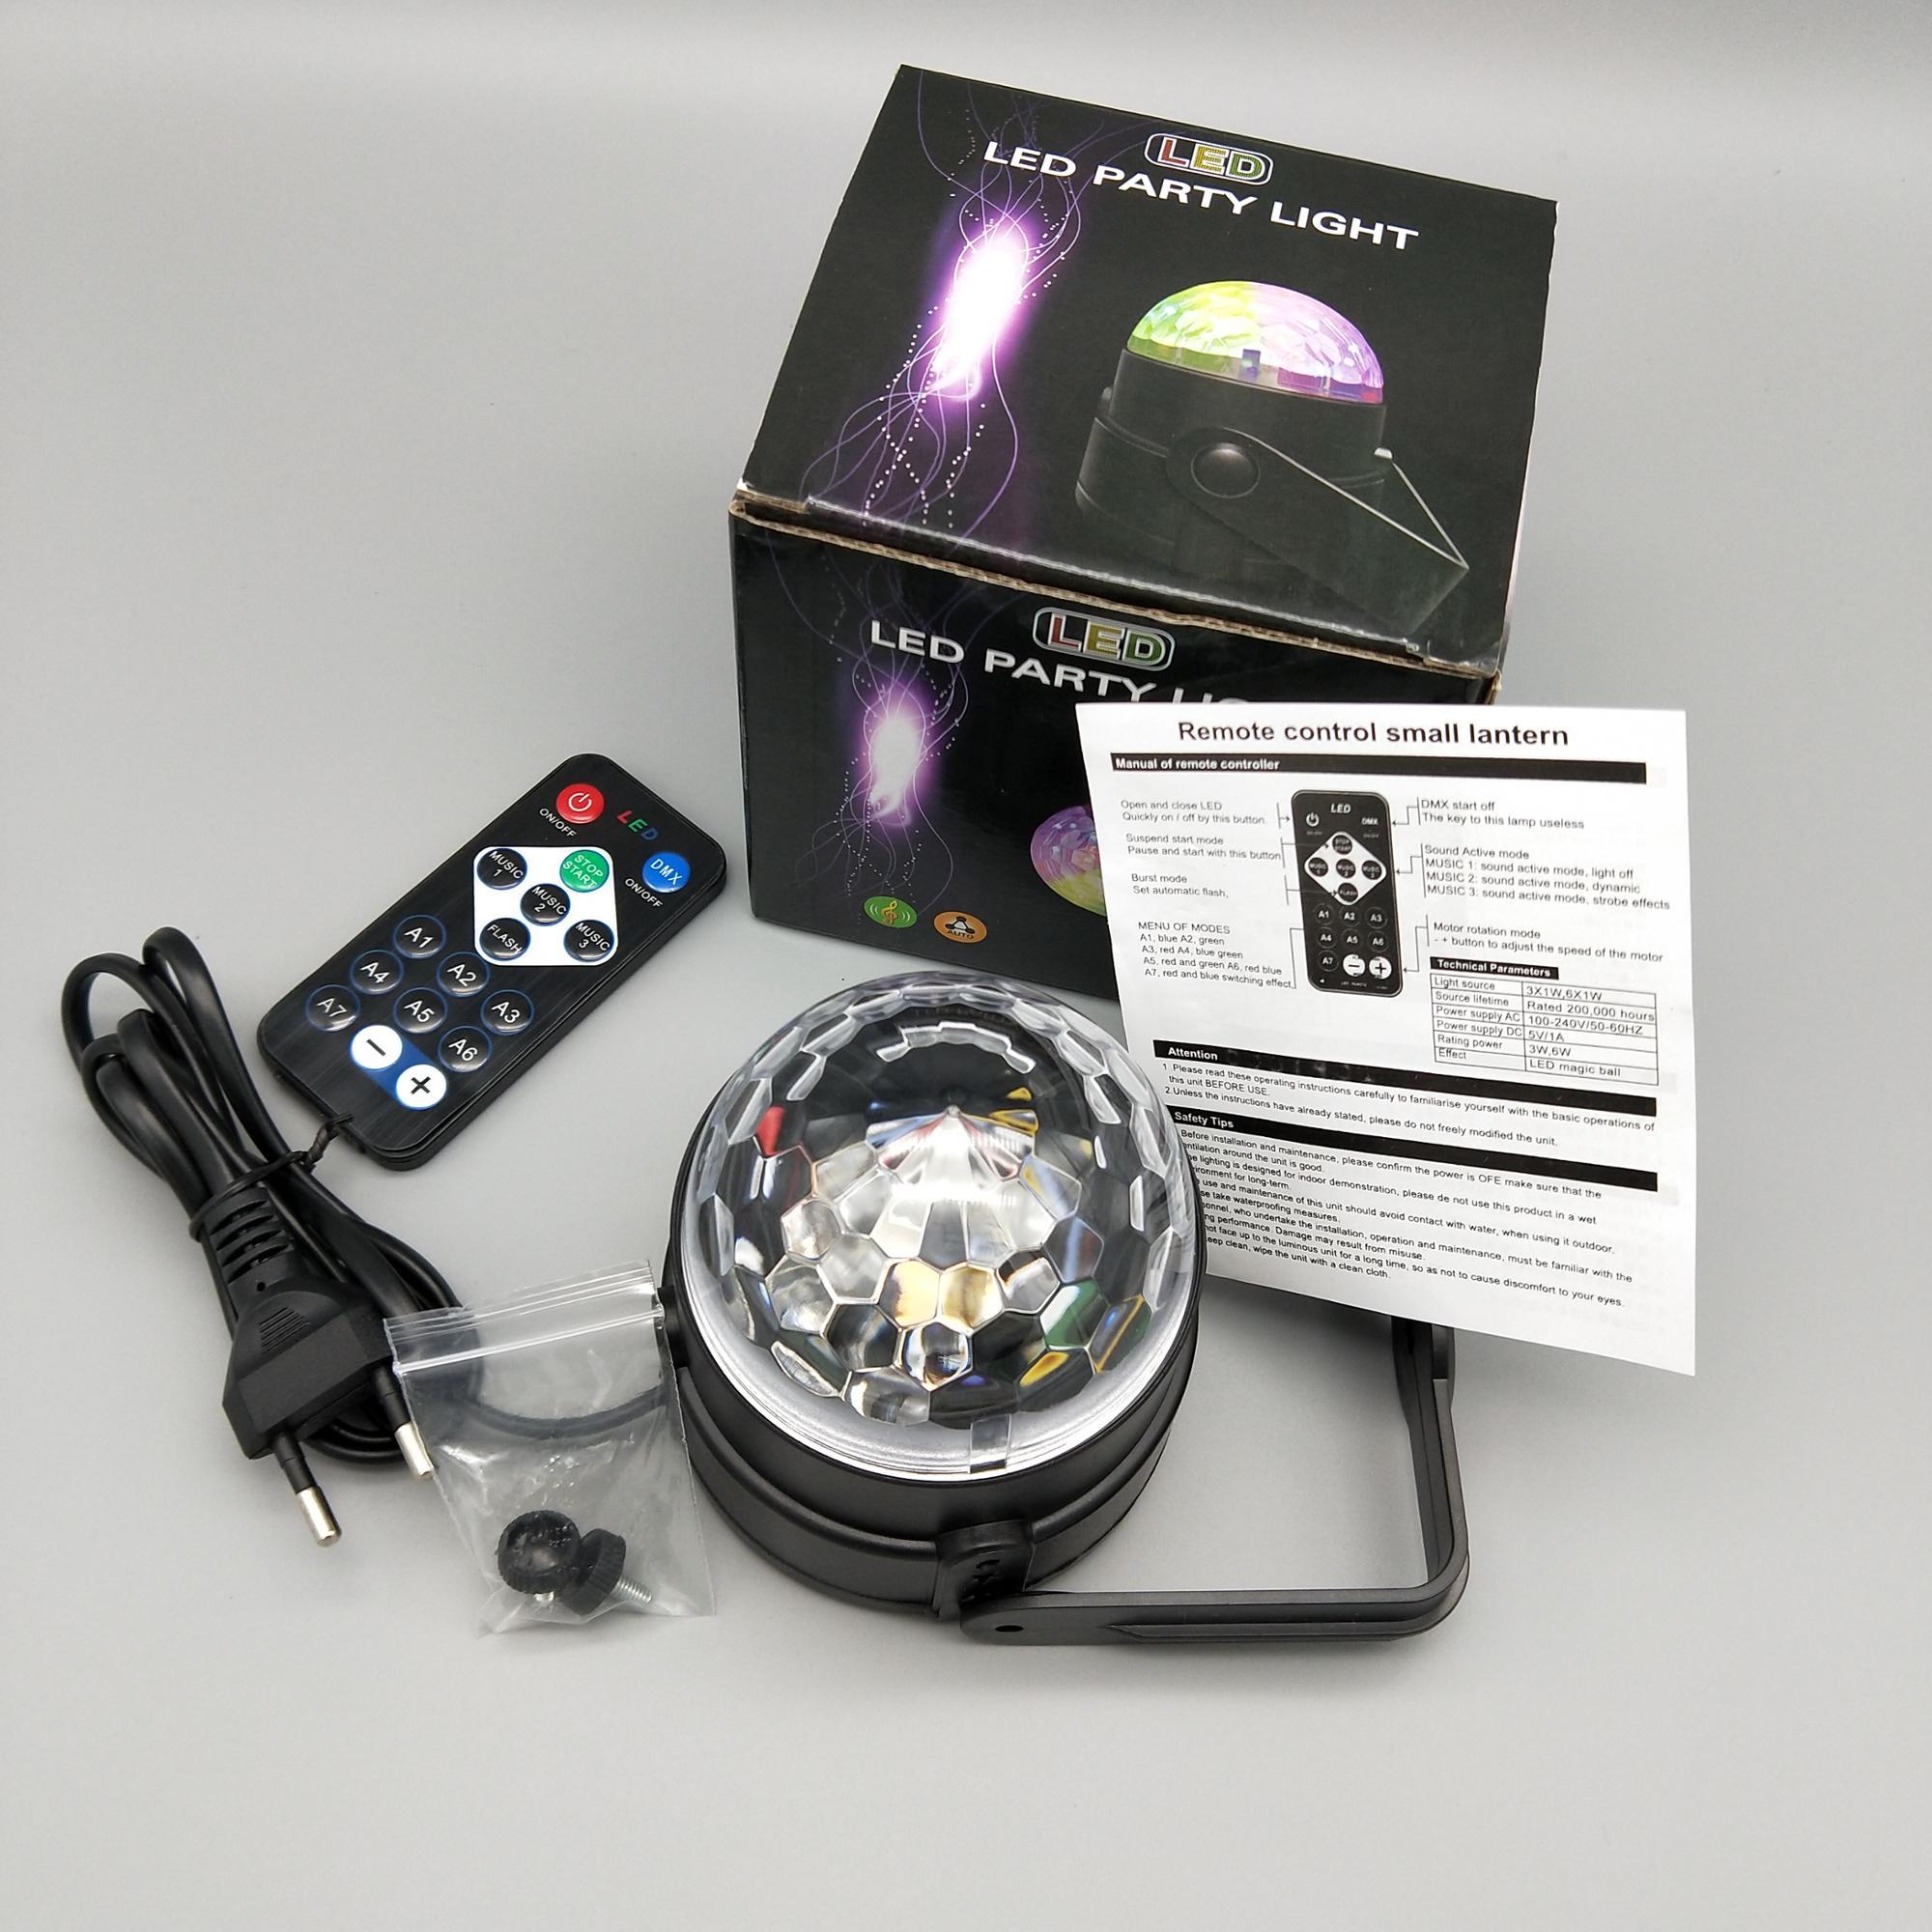 Led Crystal Magic Ball 3w Mini Rgb Stage Lighting For Party Disco Club Dj Light Us Eu Plug Buy Led Crystal Magic Ball Mini Rgb Stage Lighting Product On Alibaba Com